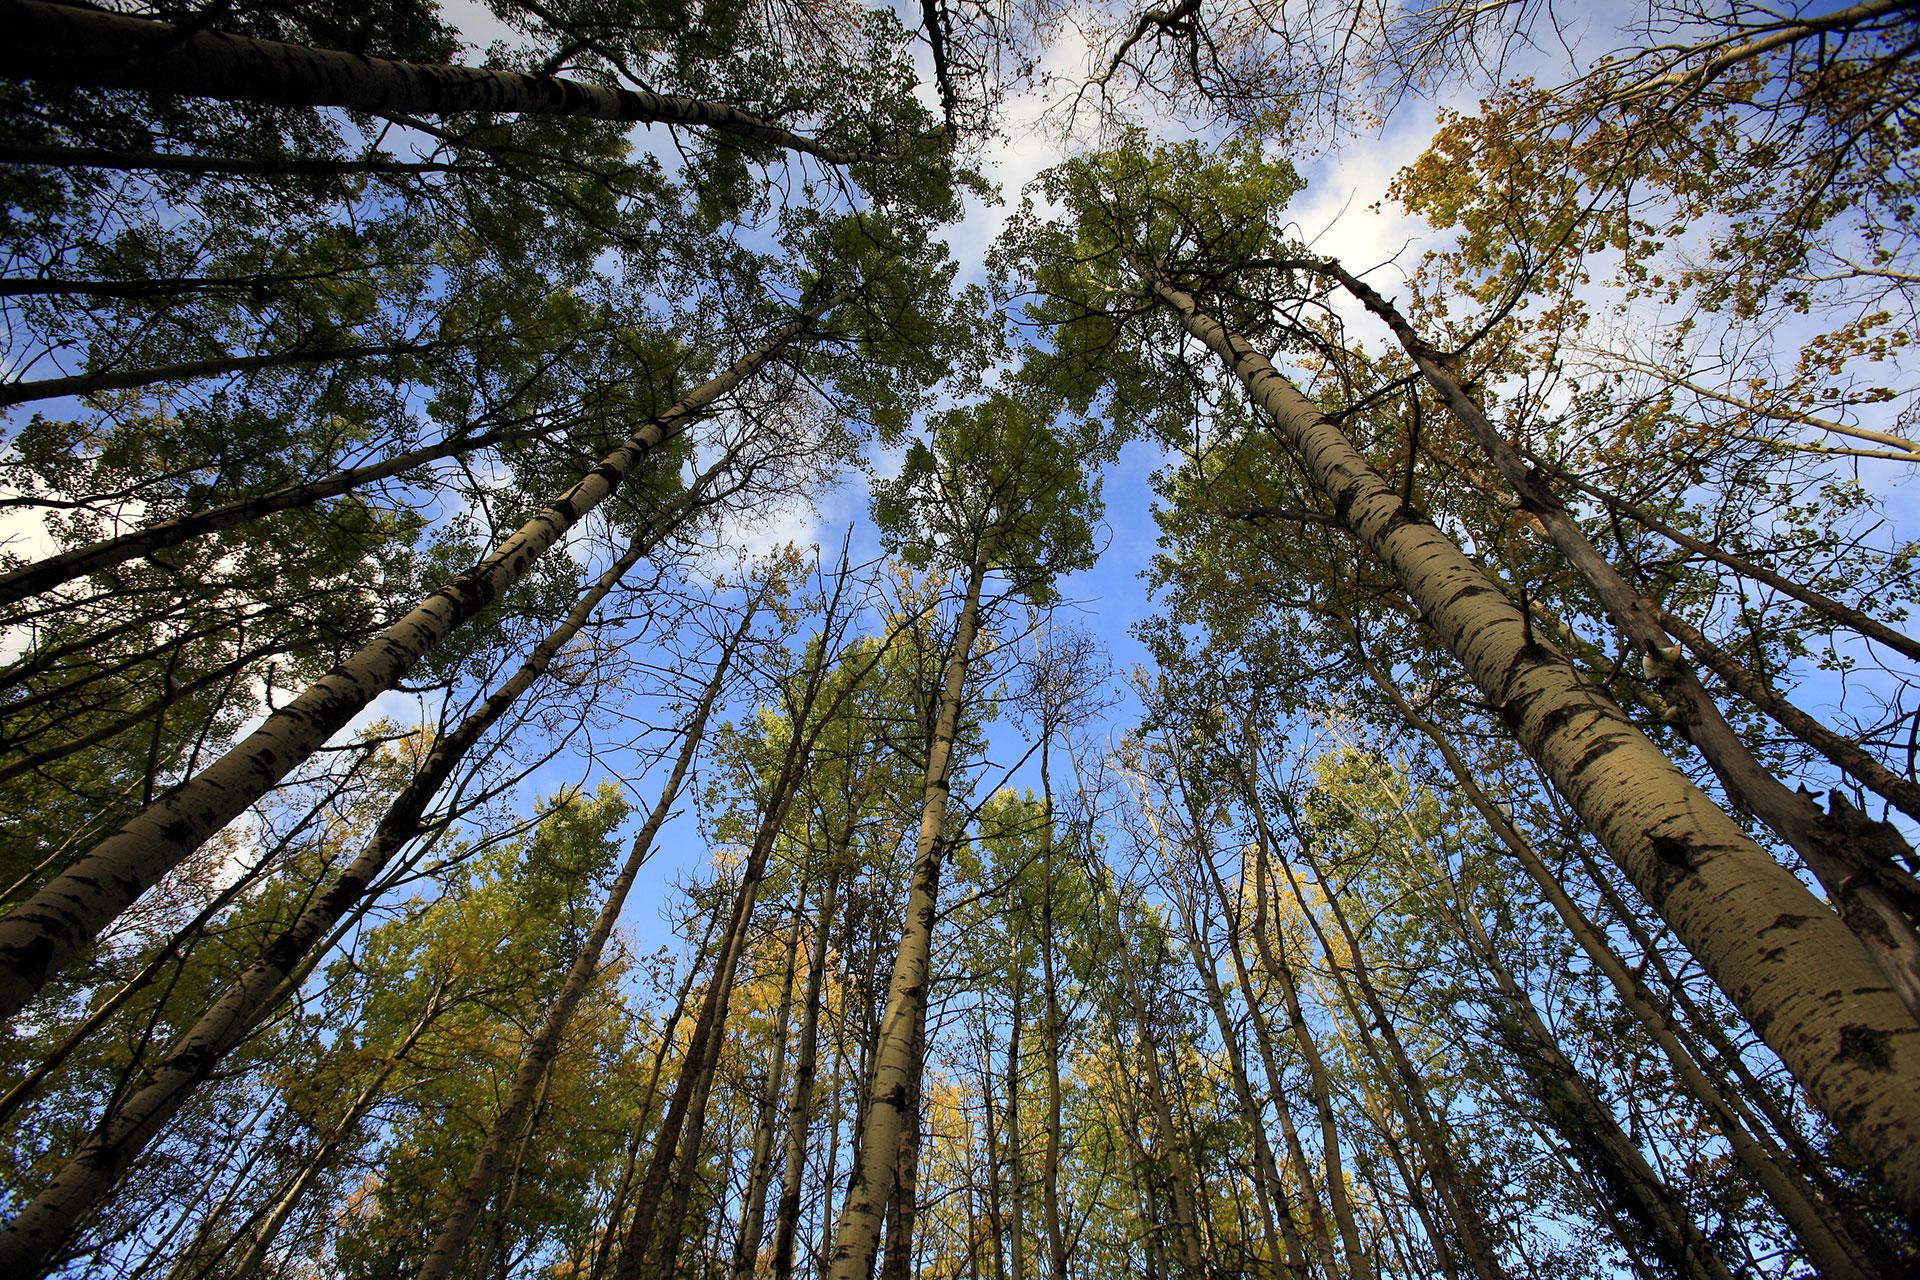 Boreal Forest in Alberta, Canada. © Jiri Rezac / Greenpeace